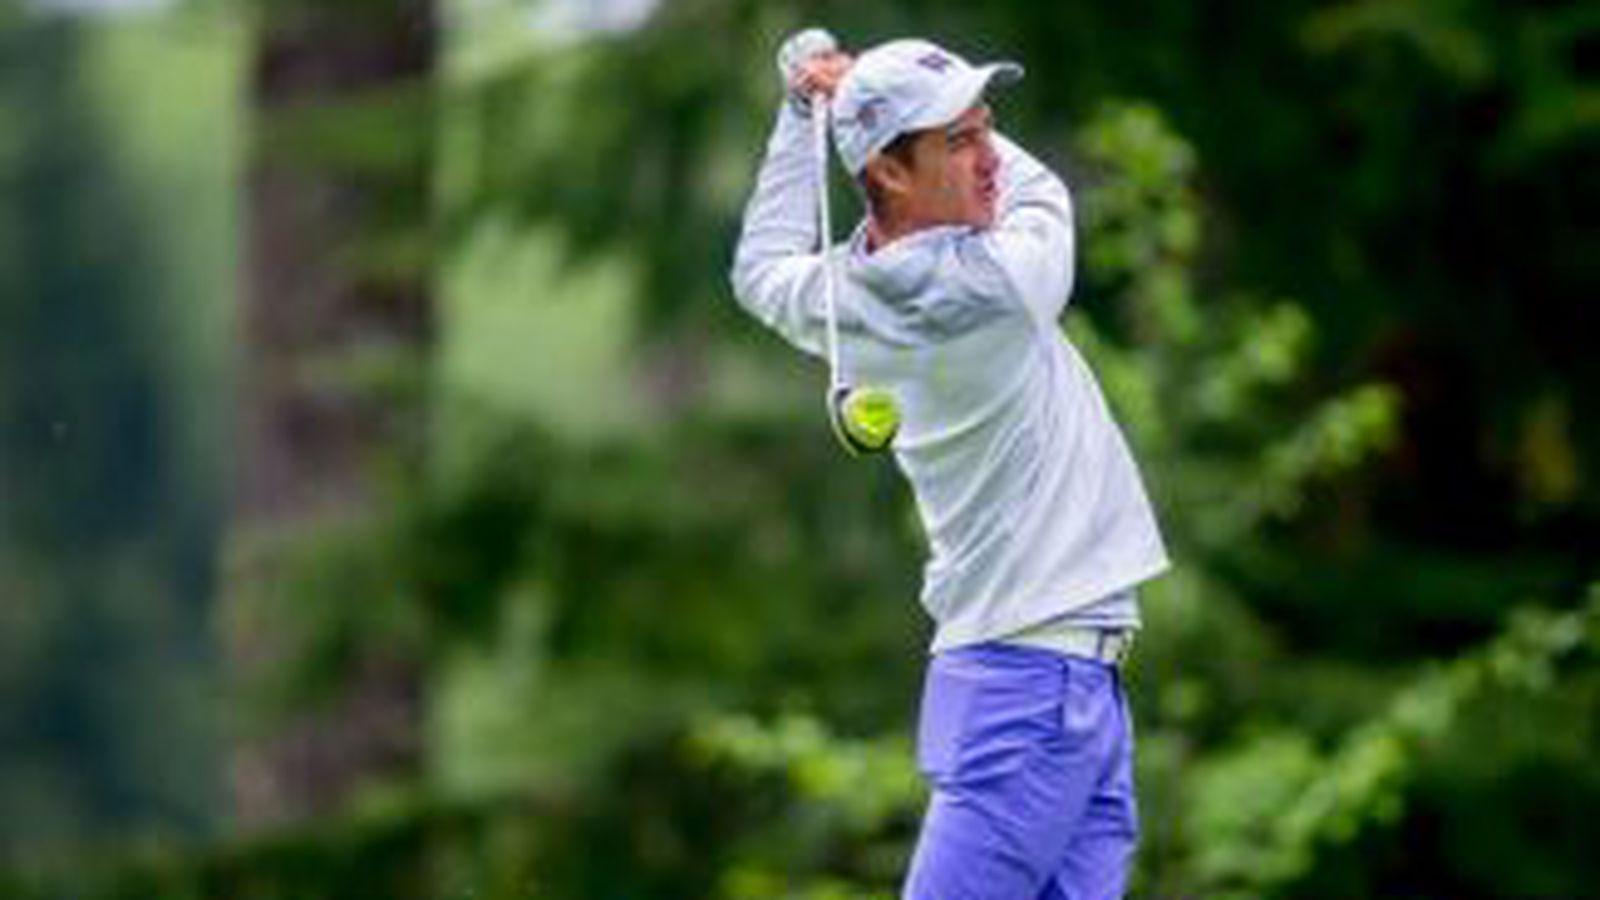 Corey_periera_1_uw_golf_2015-16.0.0